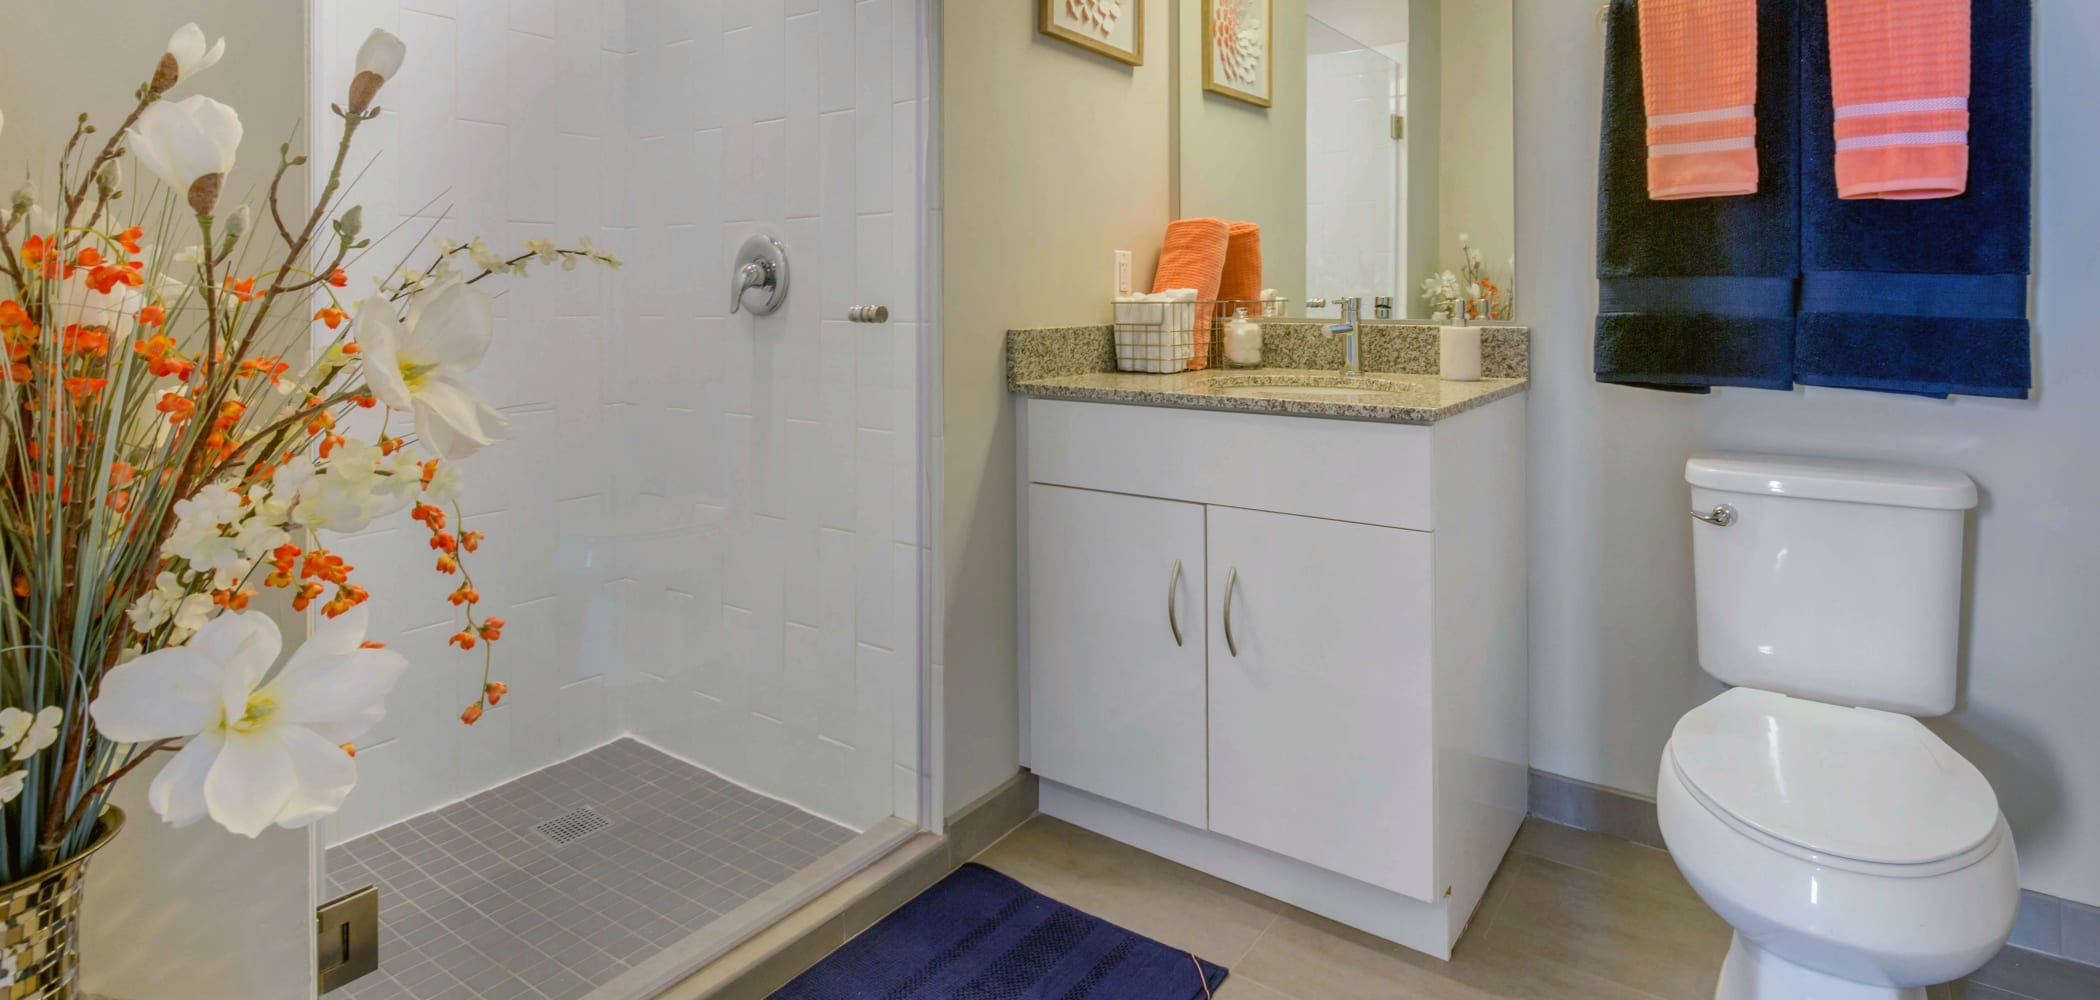 Clean bathroom at HERE Champaign in Champaign, Illinois